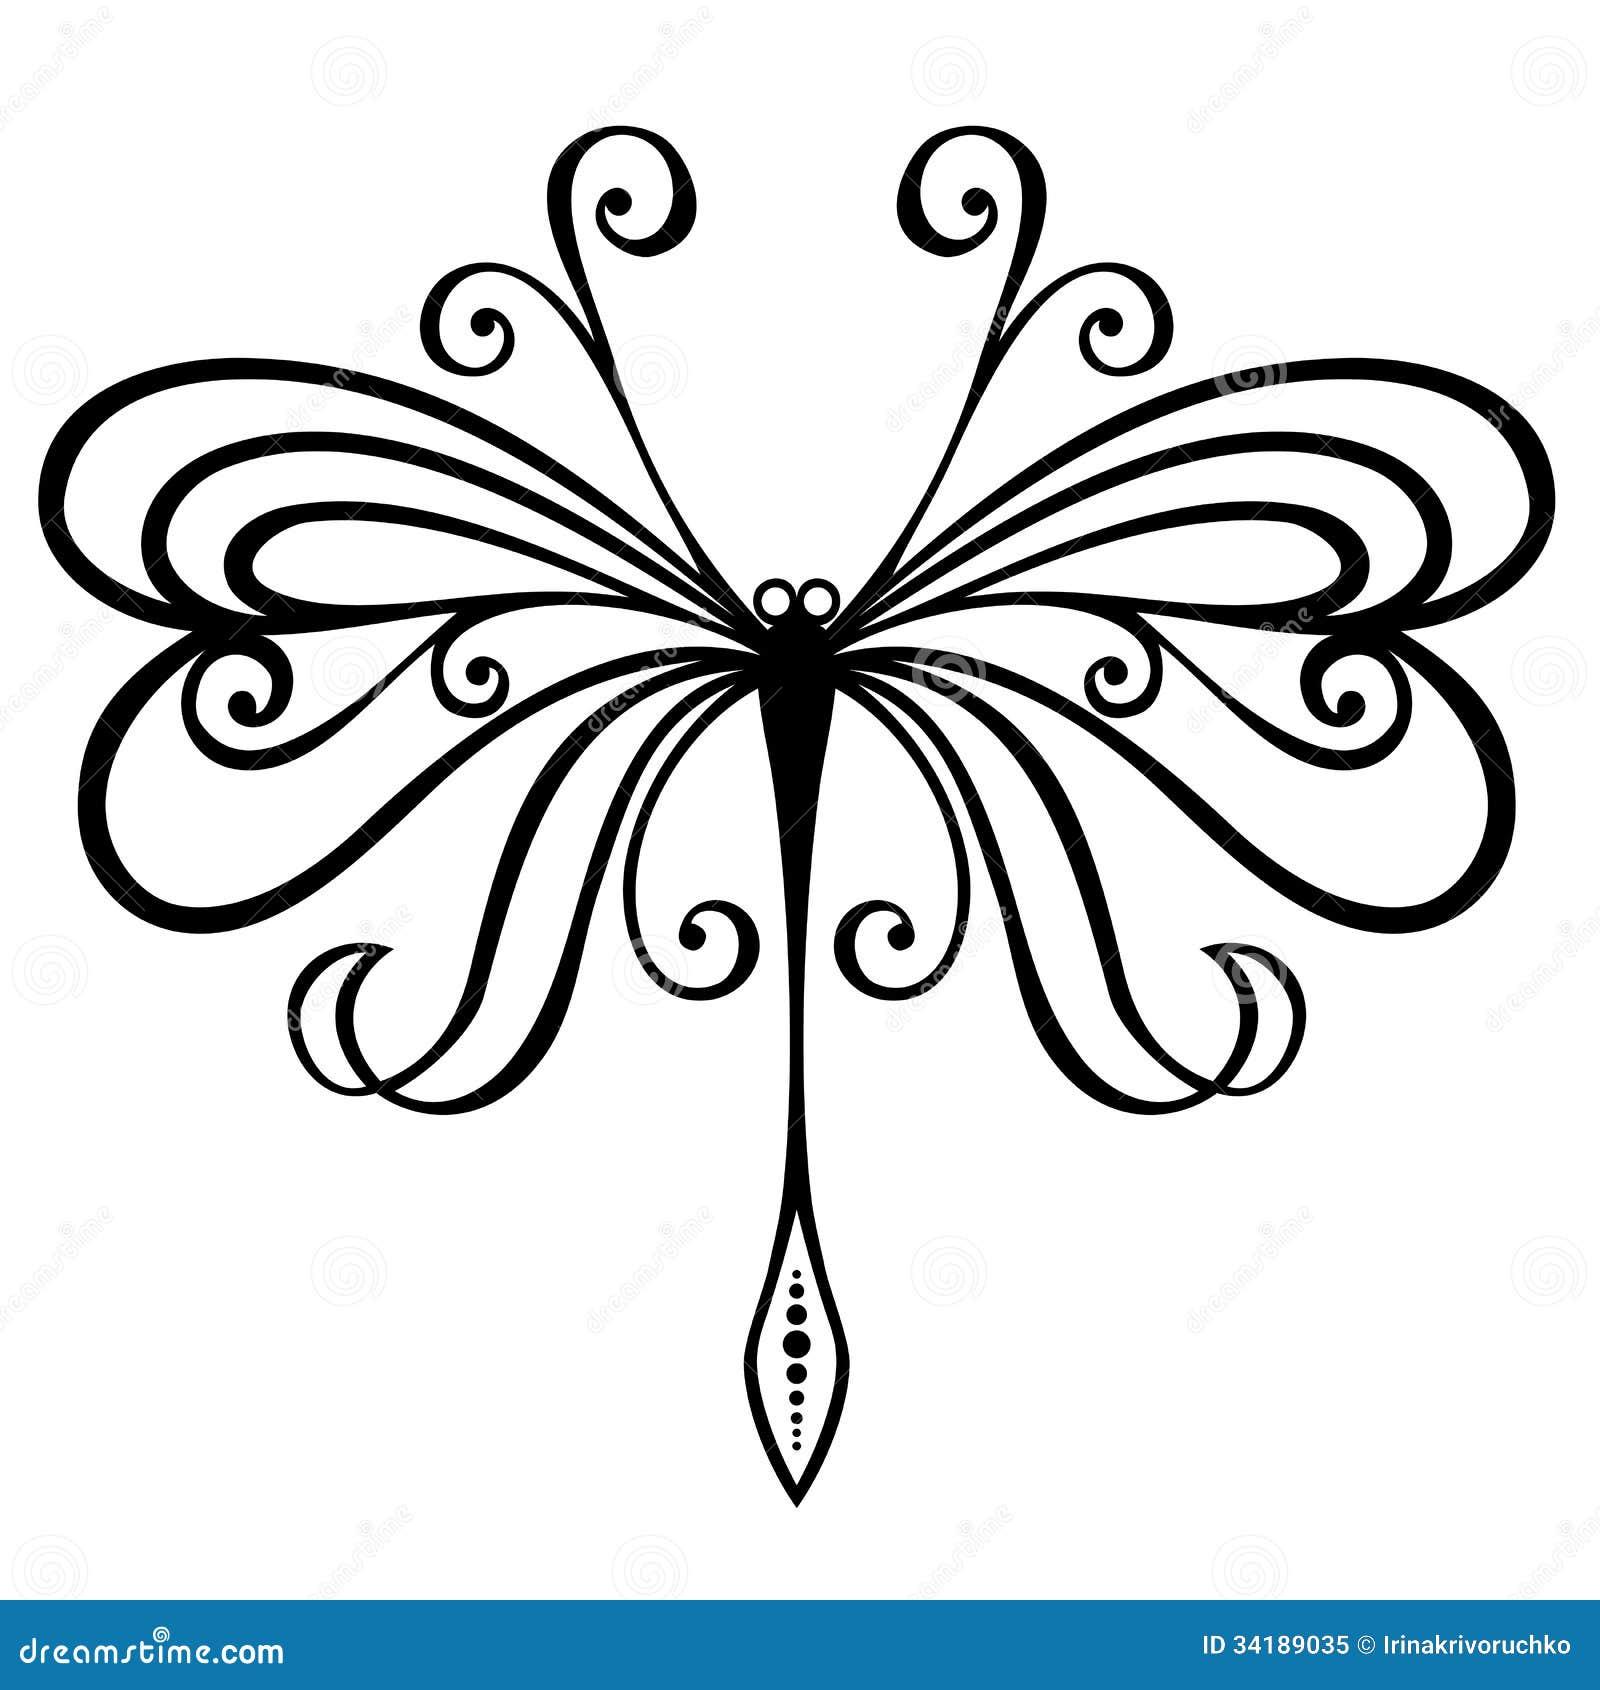 Patterned design  Tattoo